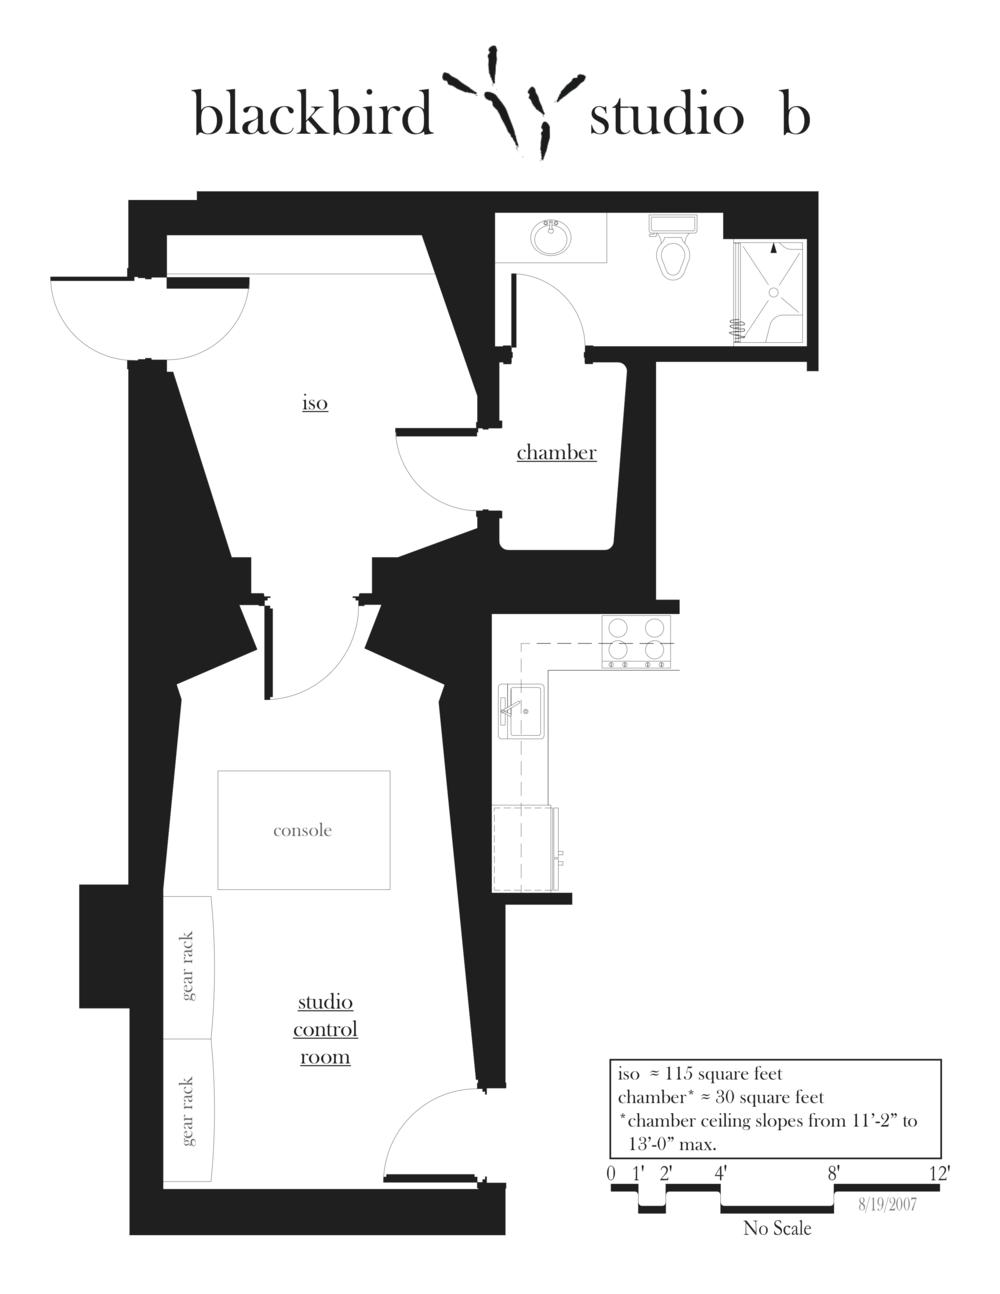 studio_b_layout.png